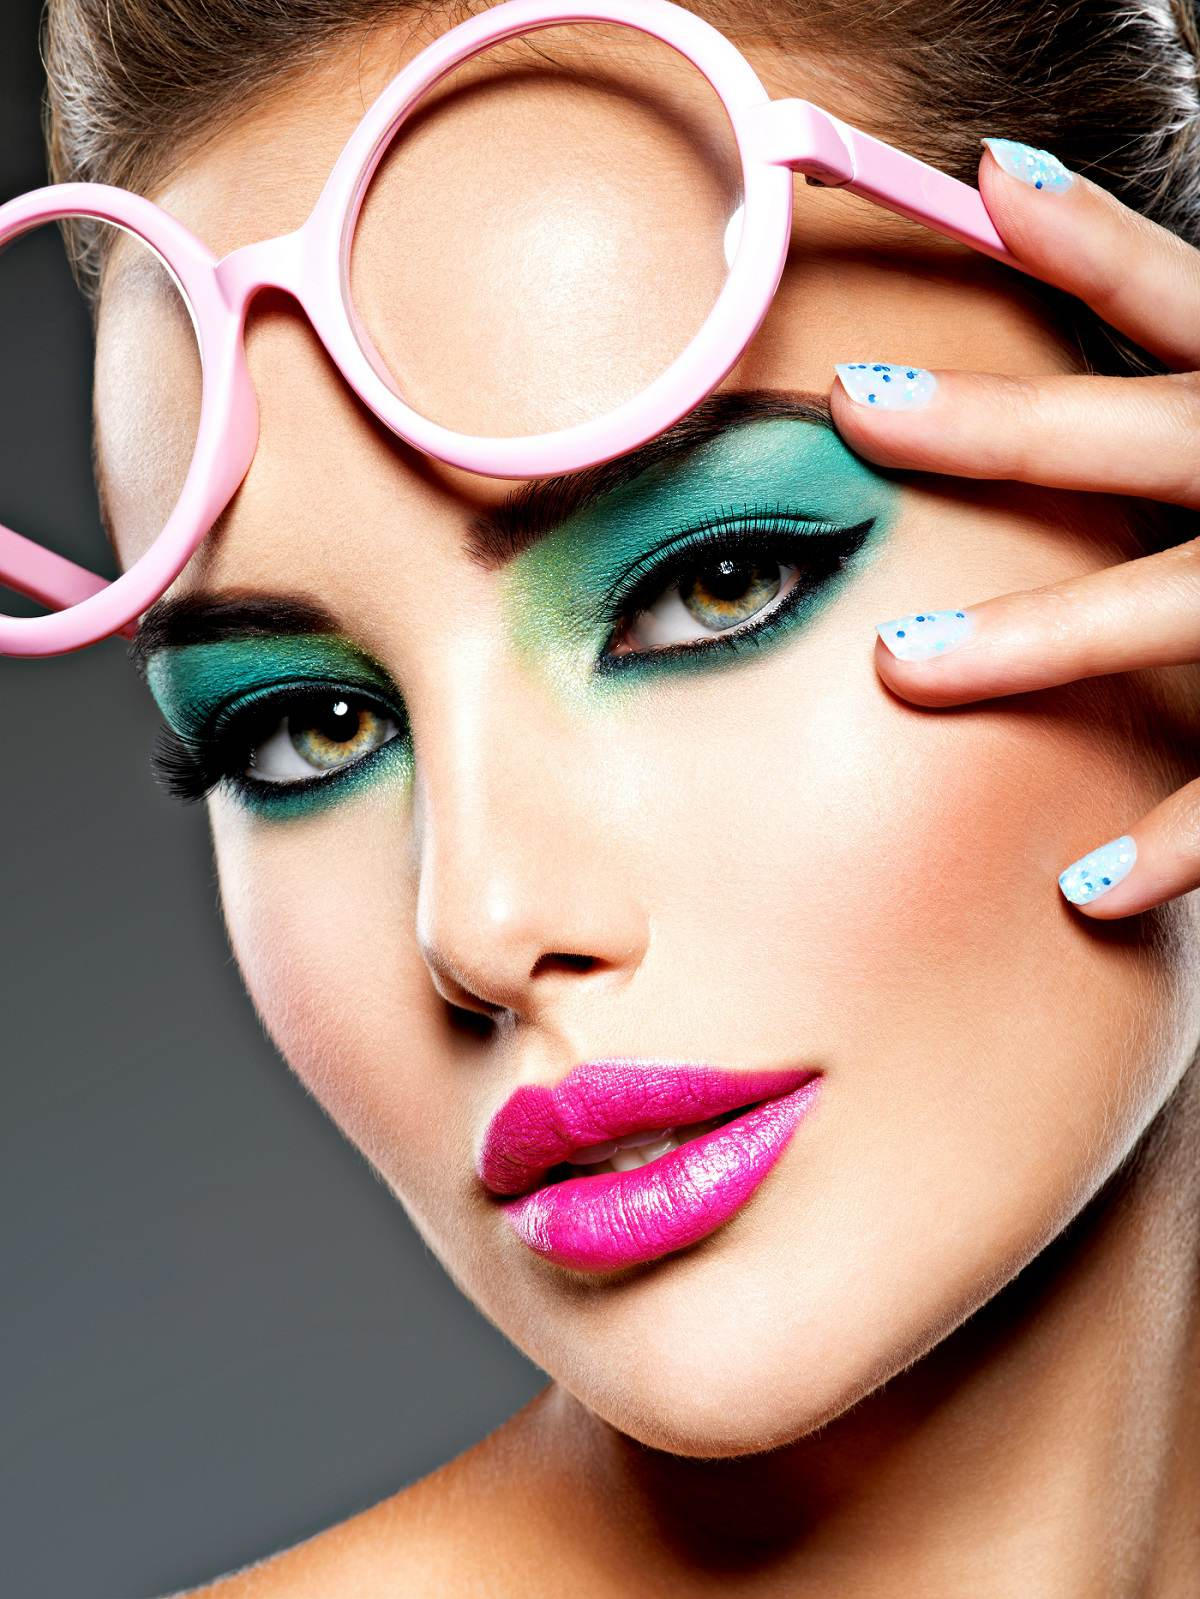 vivid-make-up-eyes-pink-glasses